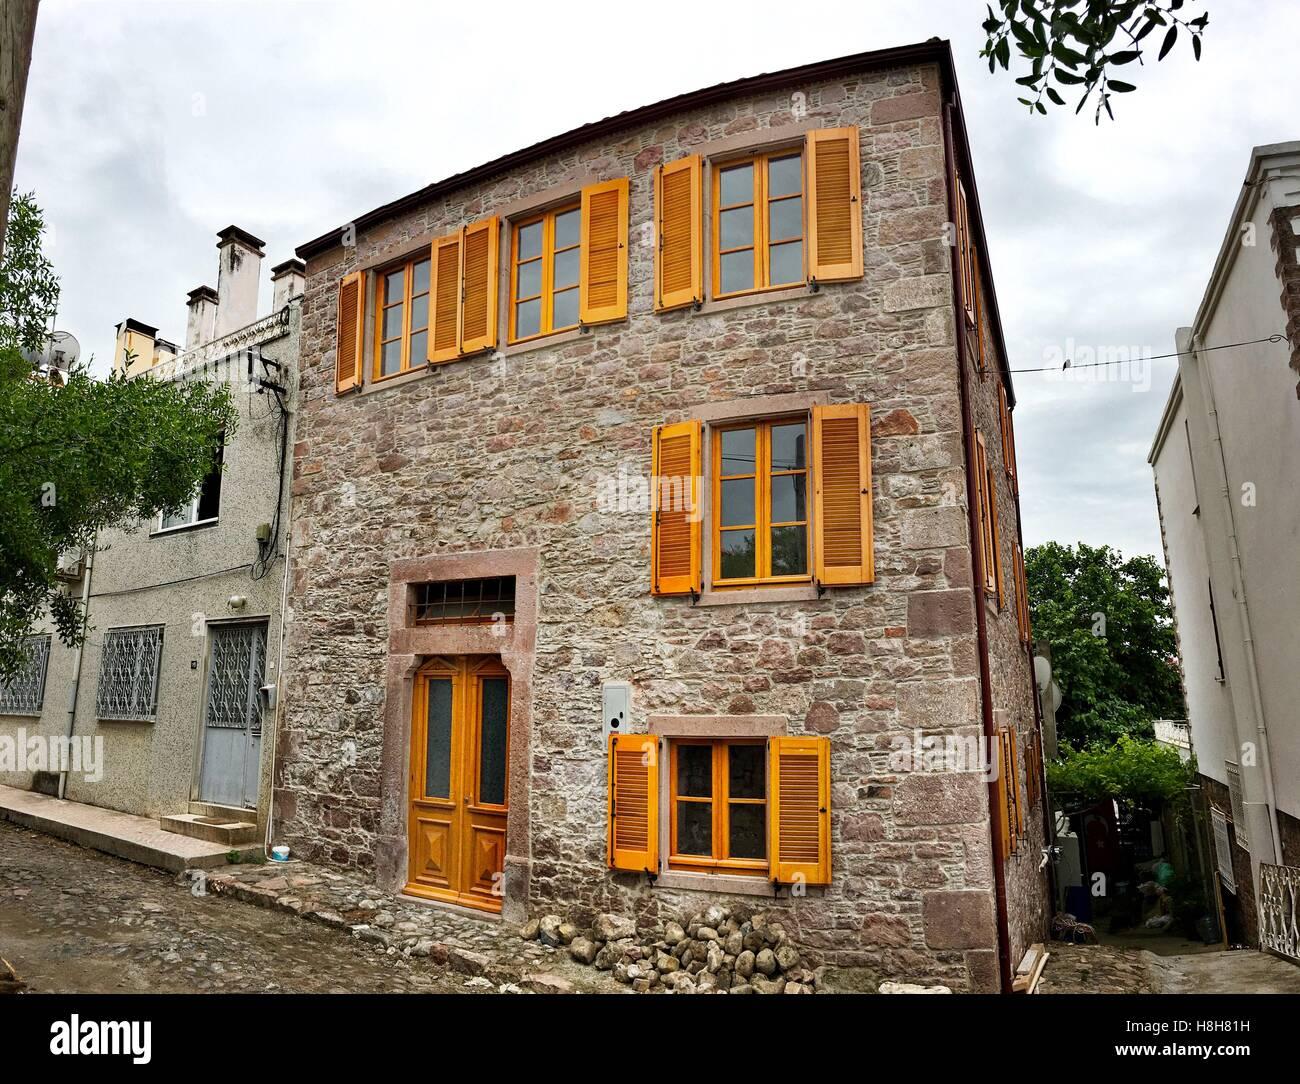 Greek Style House old greek style houses in a narrow street of cunda alibey island